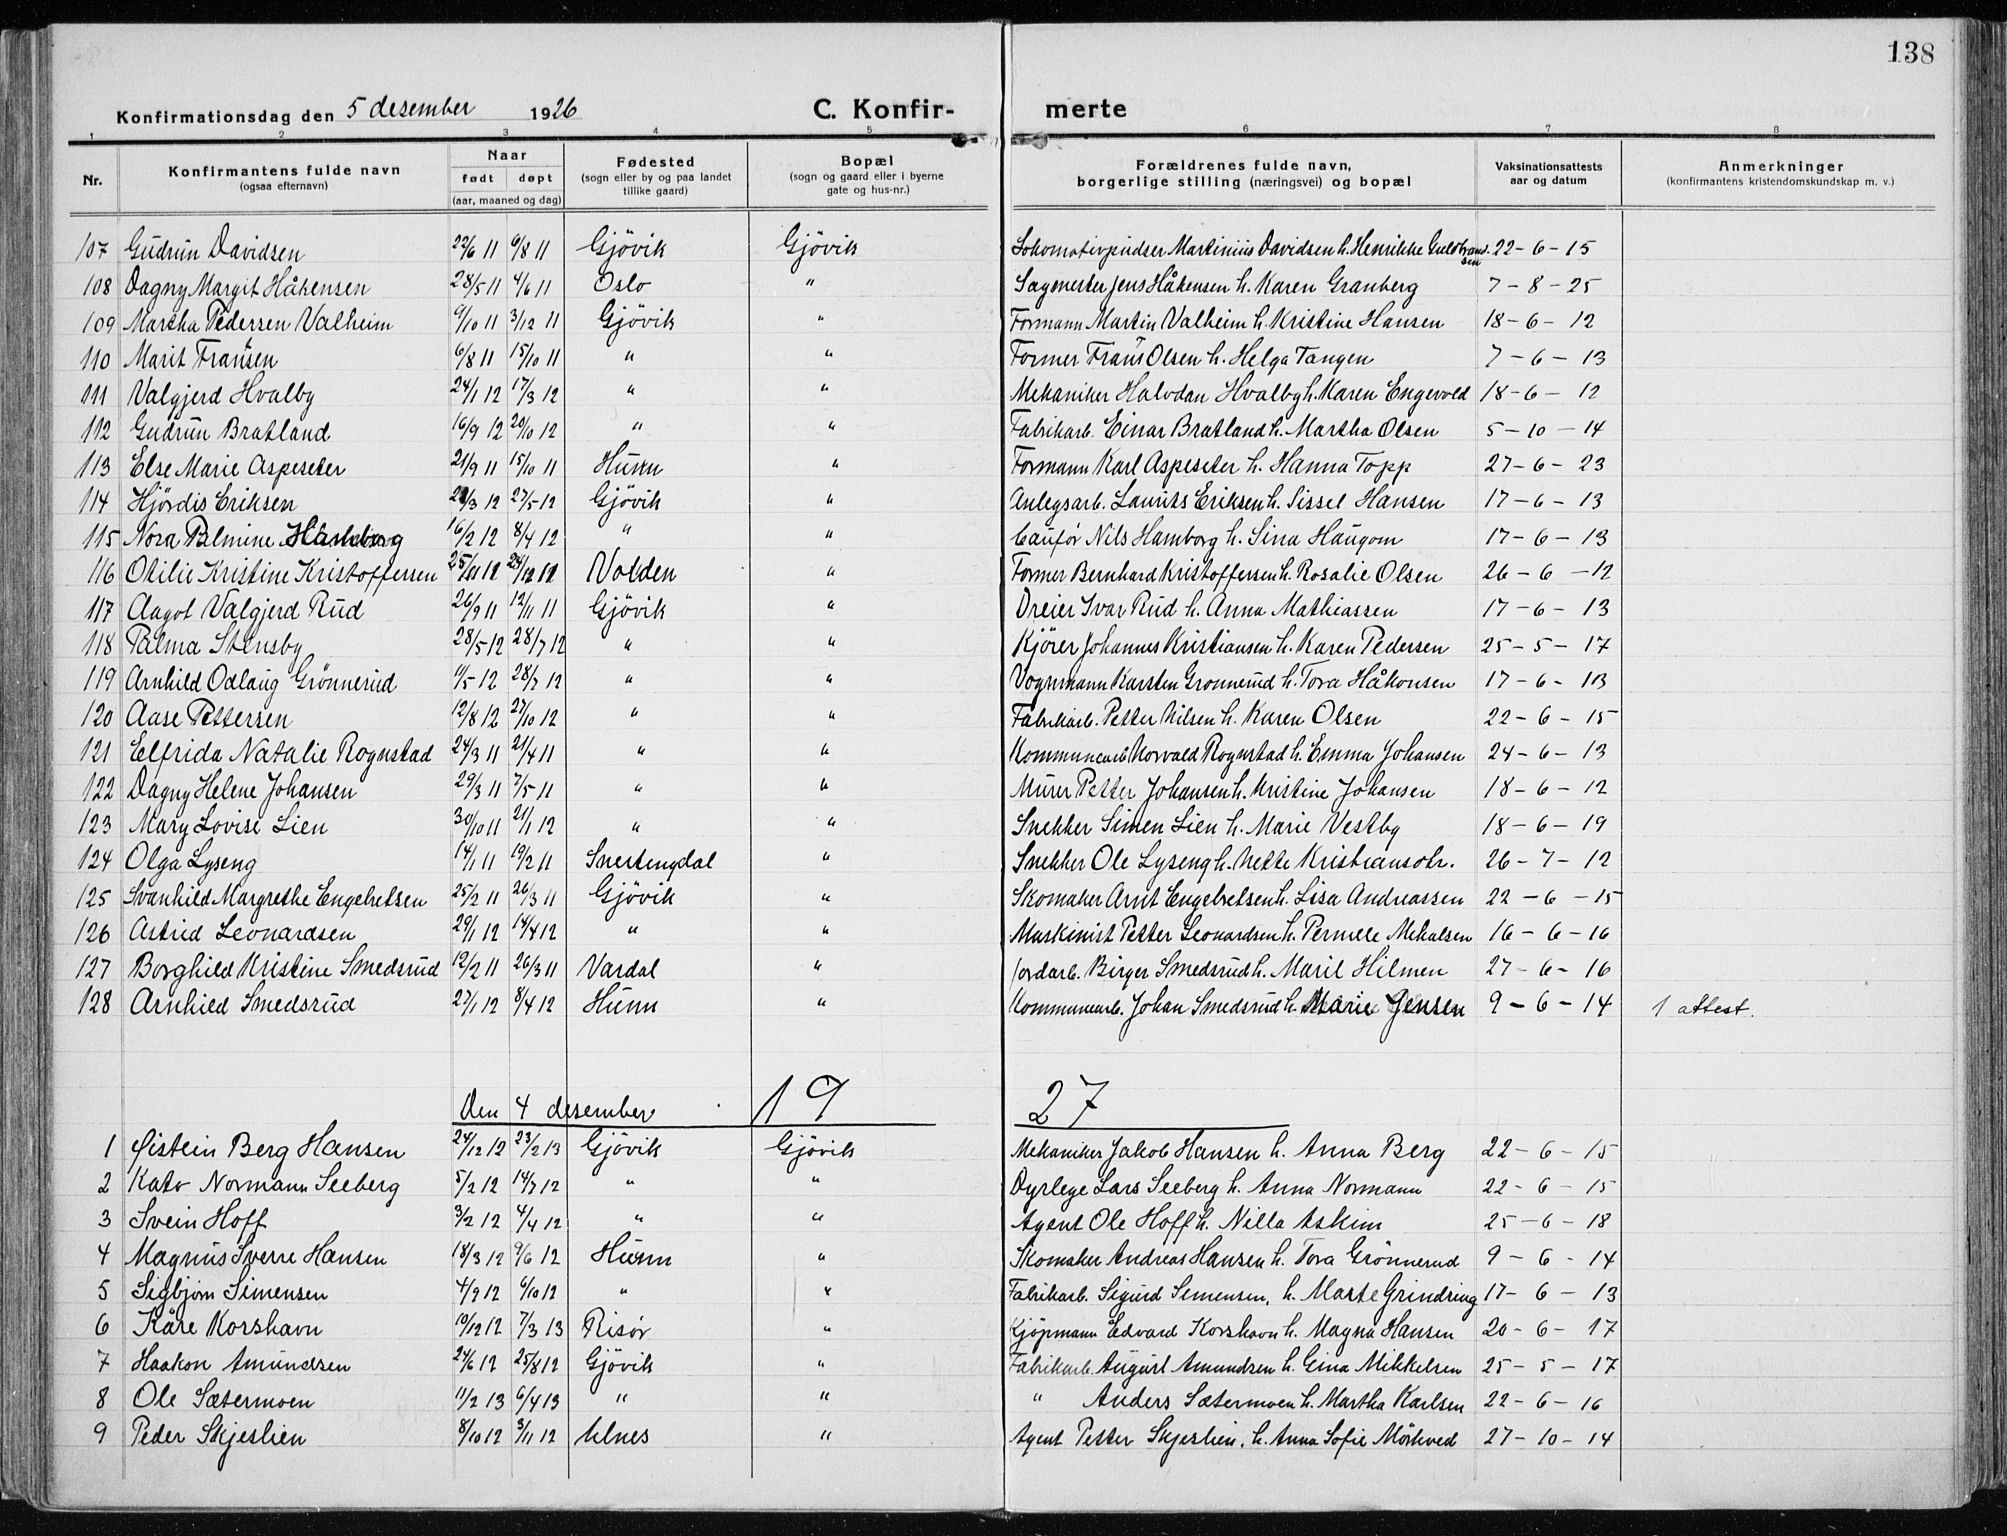 SAH, Vardal prestekontor, H/Ha/Haa/L0015: Ministerialbok nr. 15, 1923-1937, s. 138